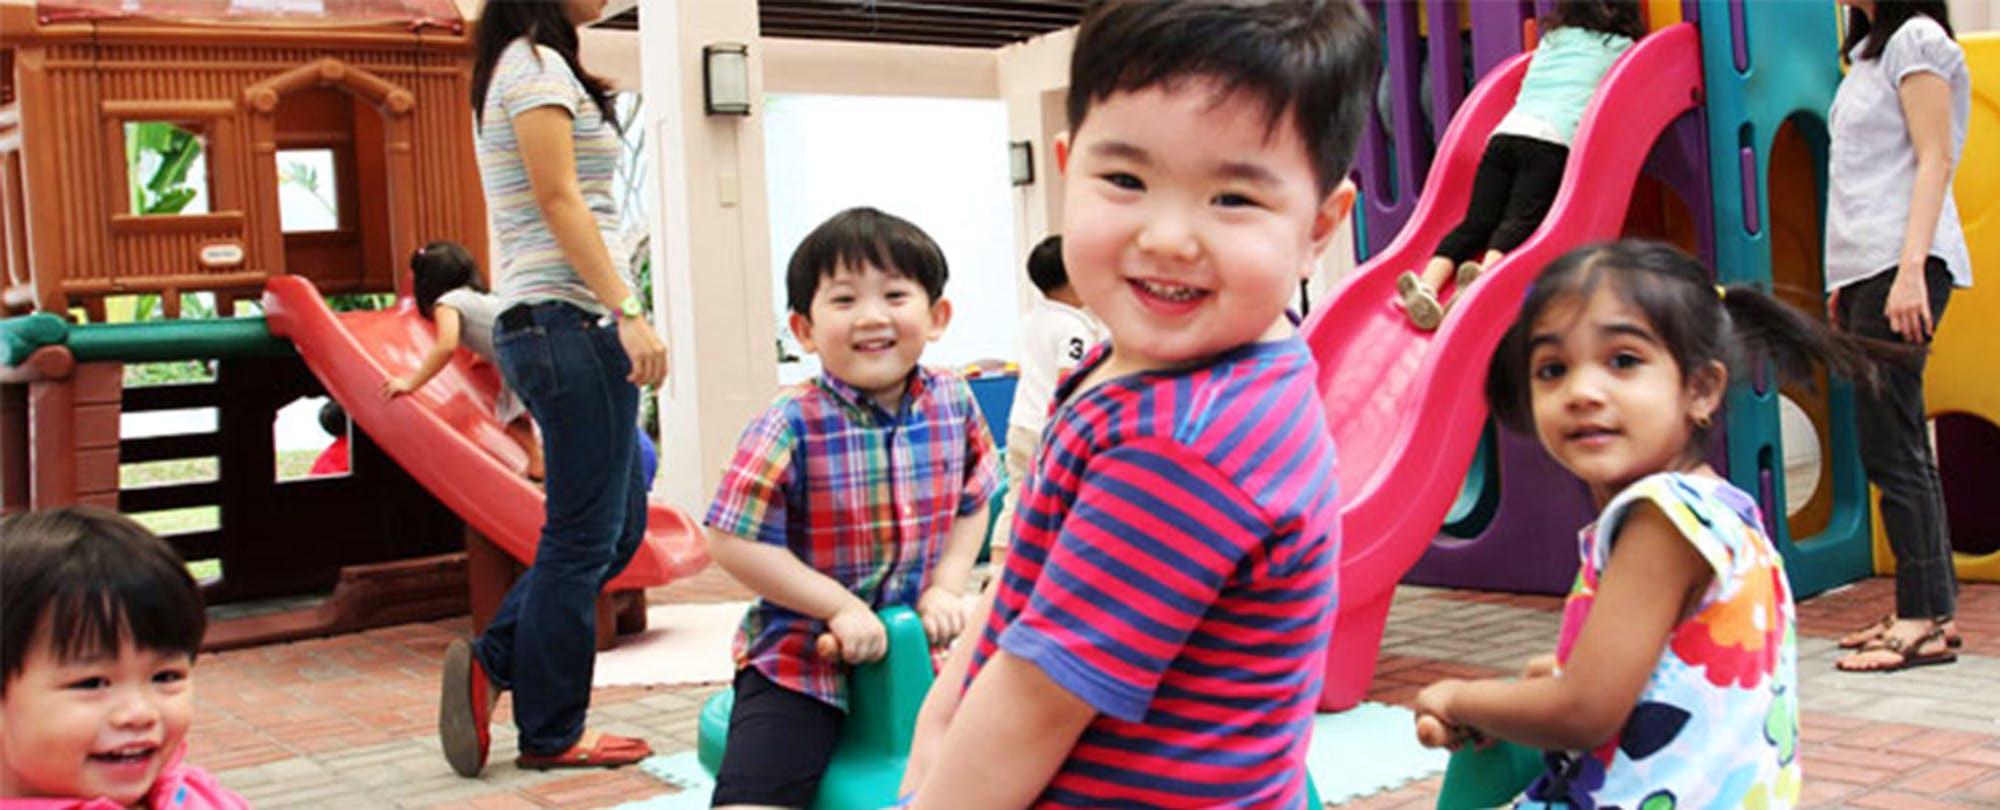 Next Generation Preschool Math: Seven Guiding Principles for Design-Based Research